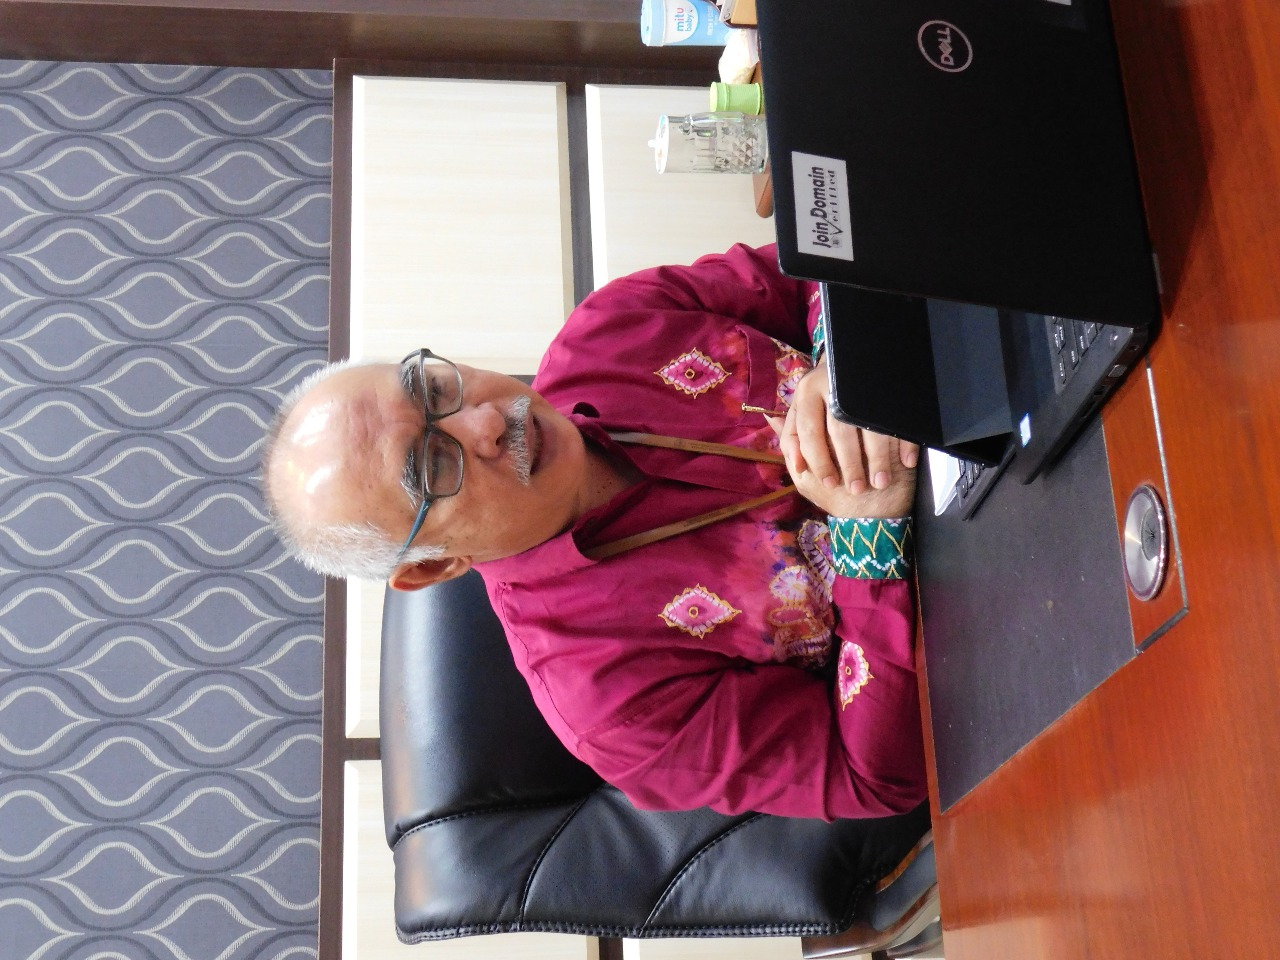 Goes To Universitas Lambung Mangkurat, DJKN kenalkan APBN dalam Perspektif Kekayaan Negara dan Lelang